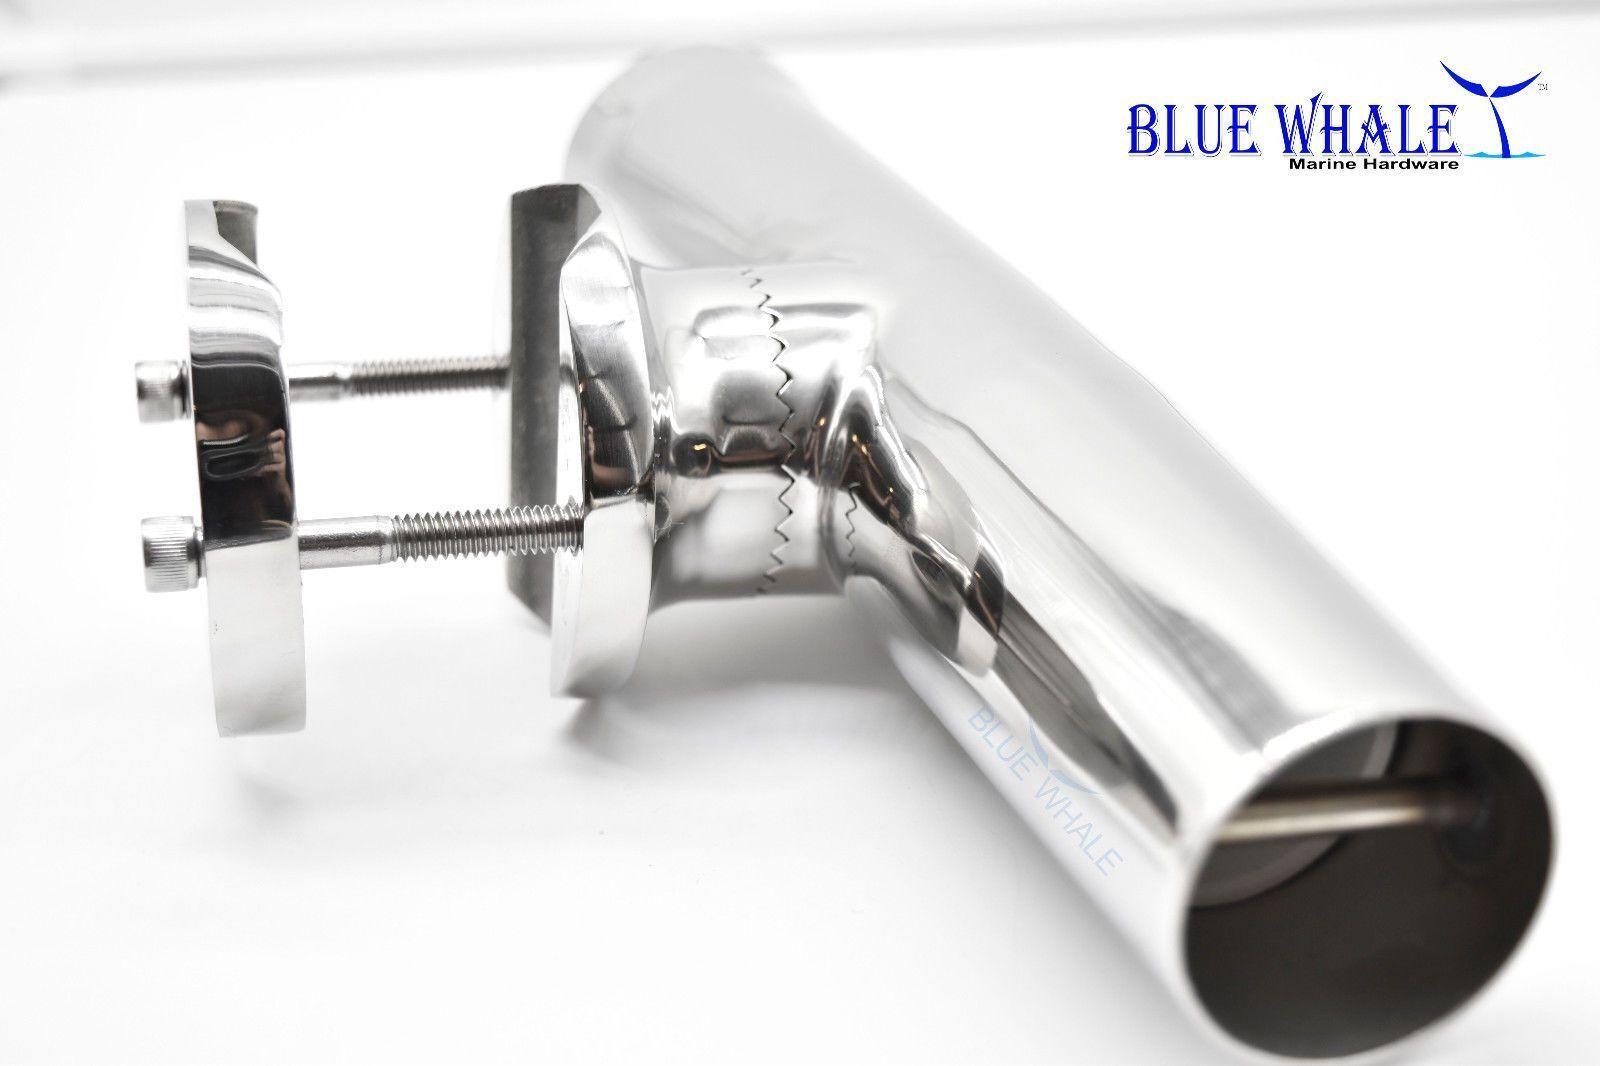 2PCS Luxury Clamp-on Fishing Rod Holder Holder Rod for Rail 1-1/4